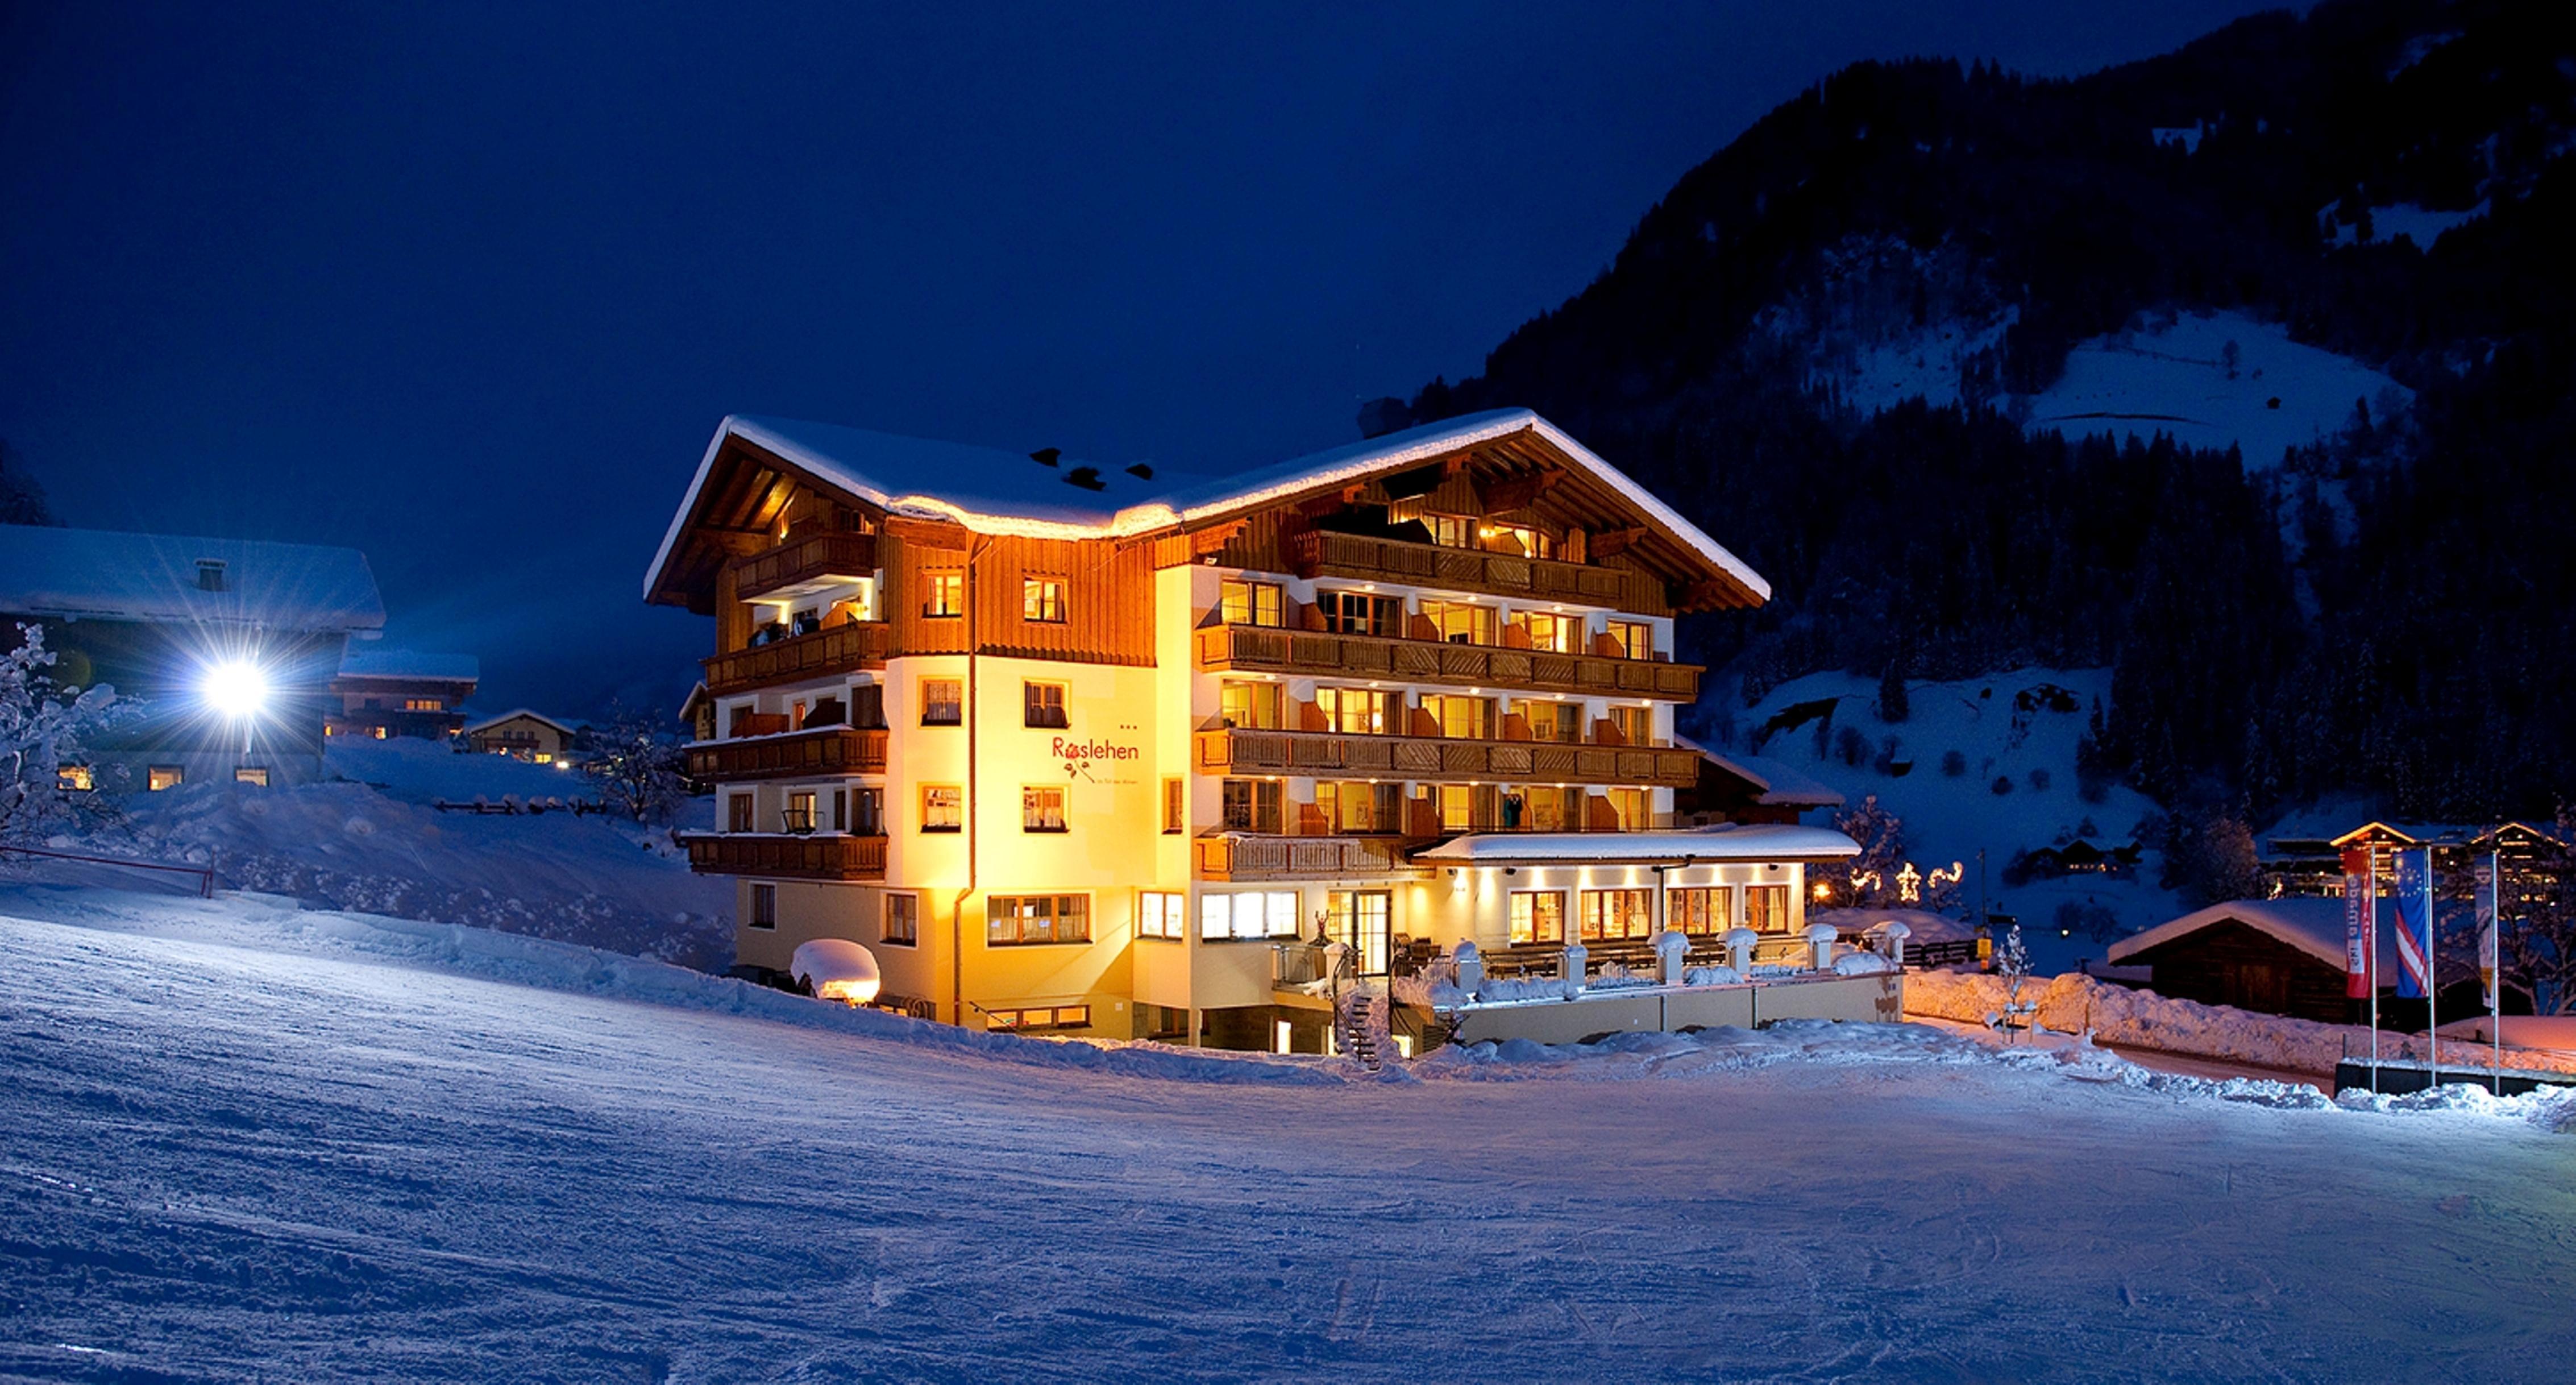 Hotel Roslehen,